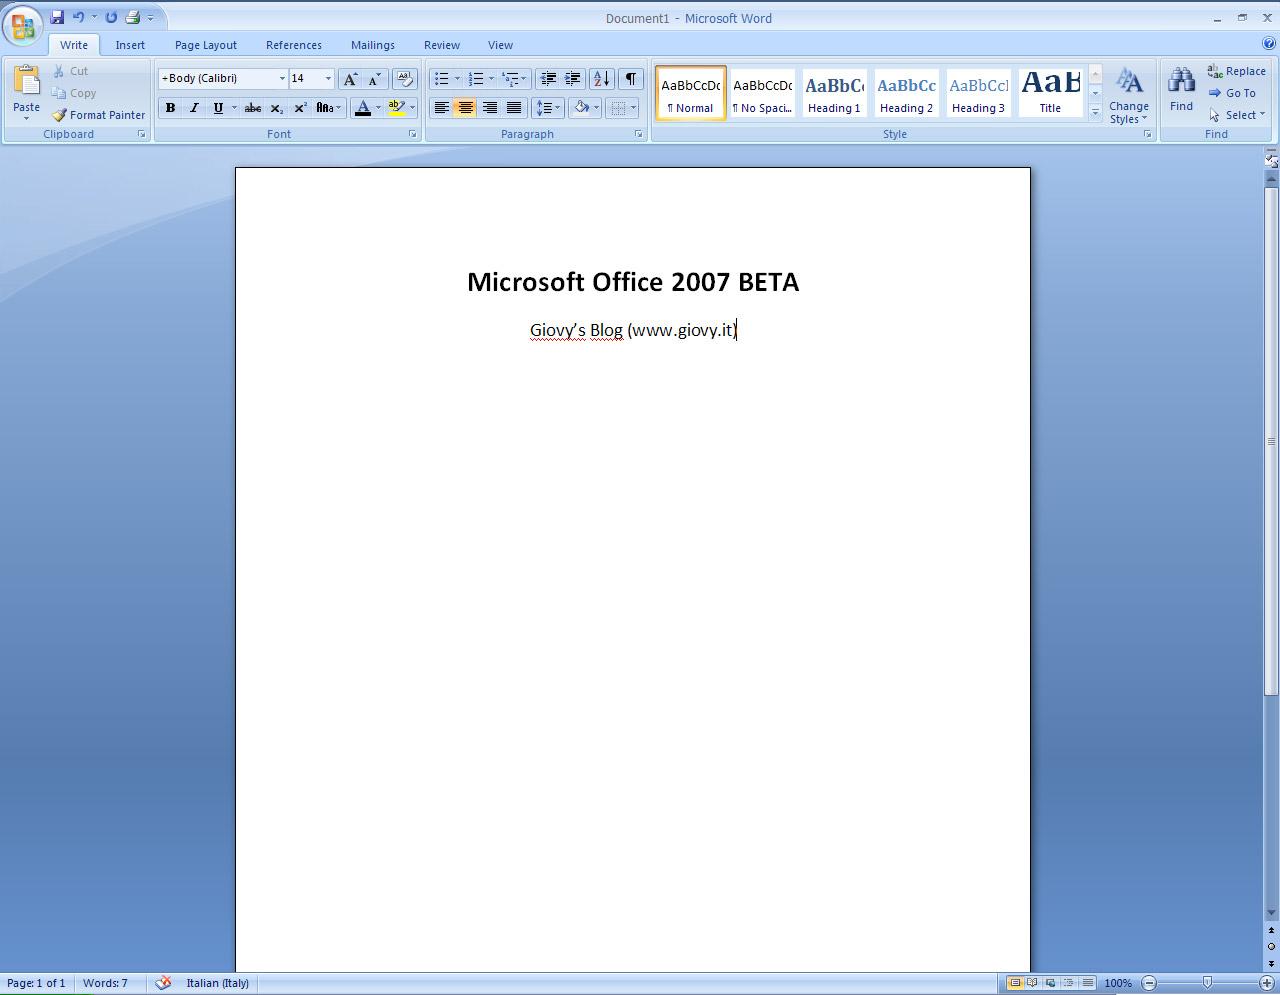 Nl Spellingscontrole Word 2007 Downloaden Free Download